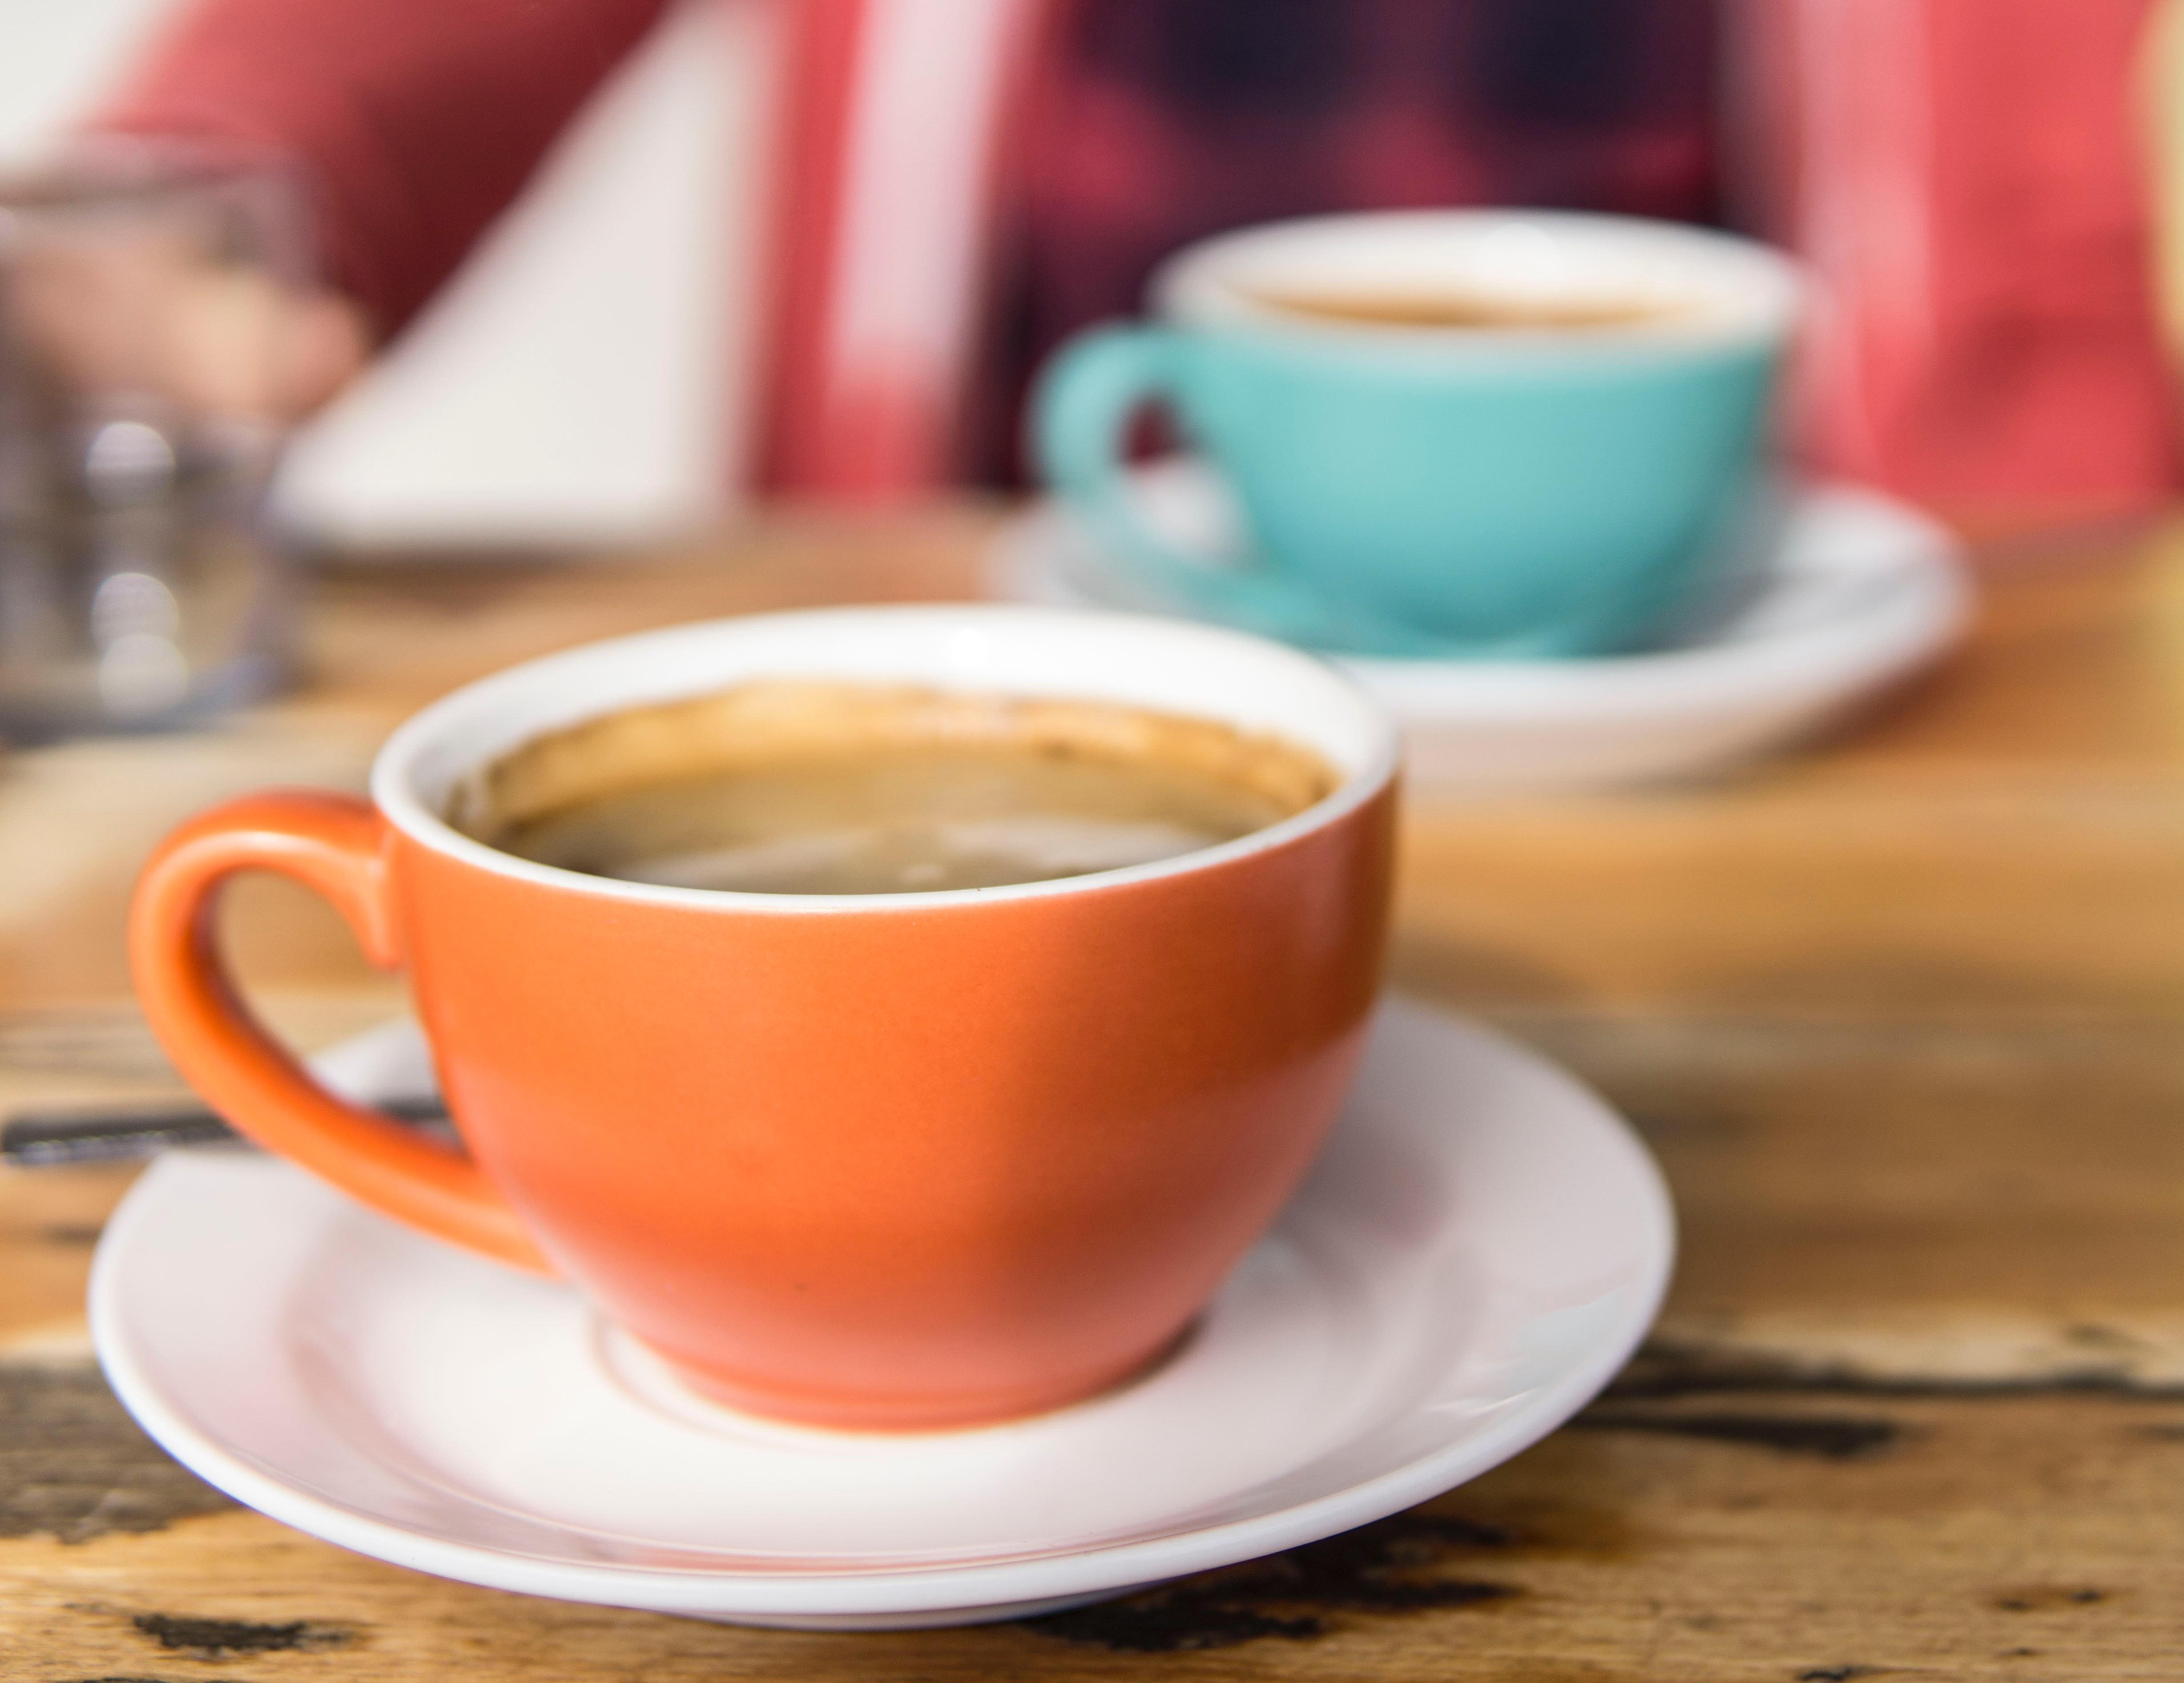 beverage-break-breakfast-1058918